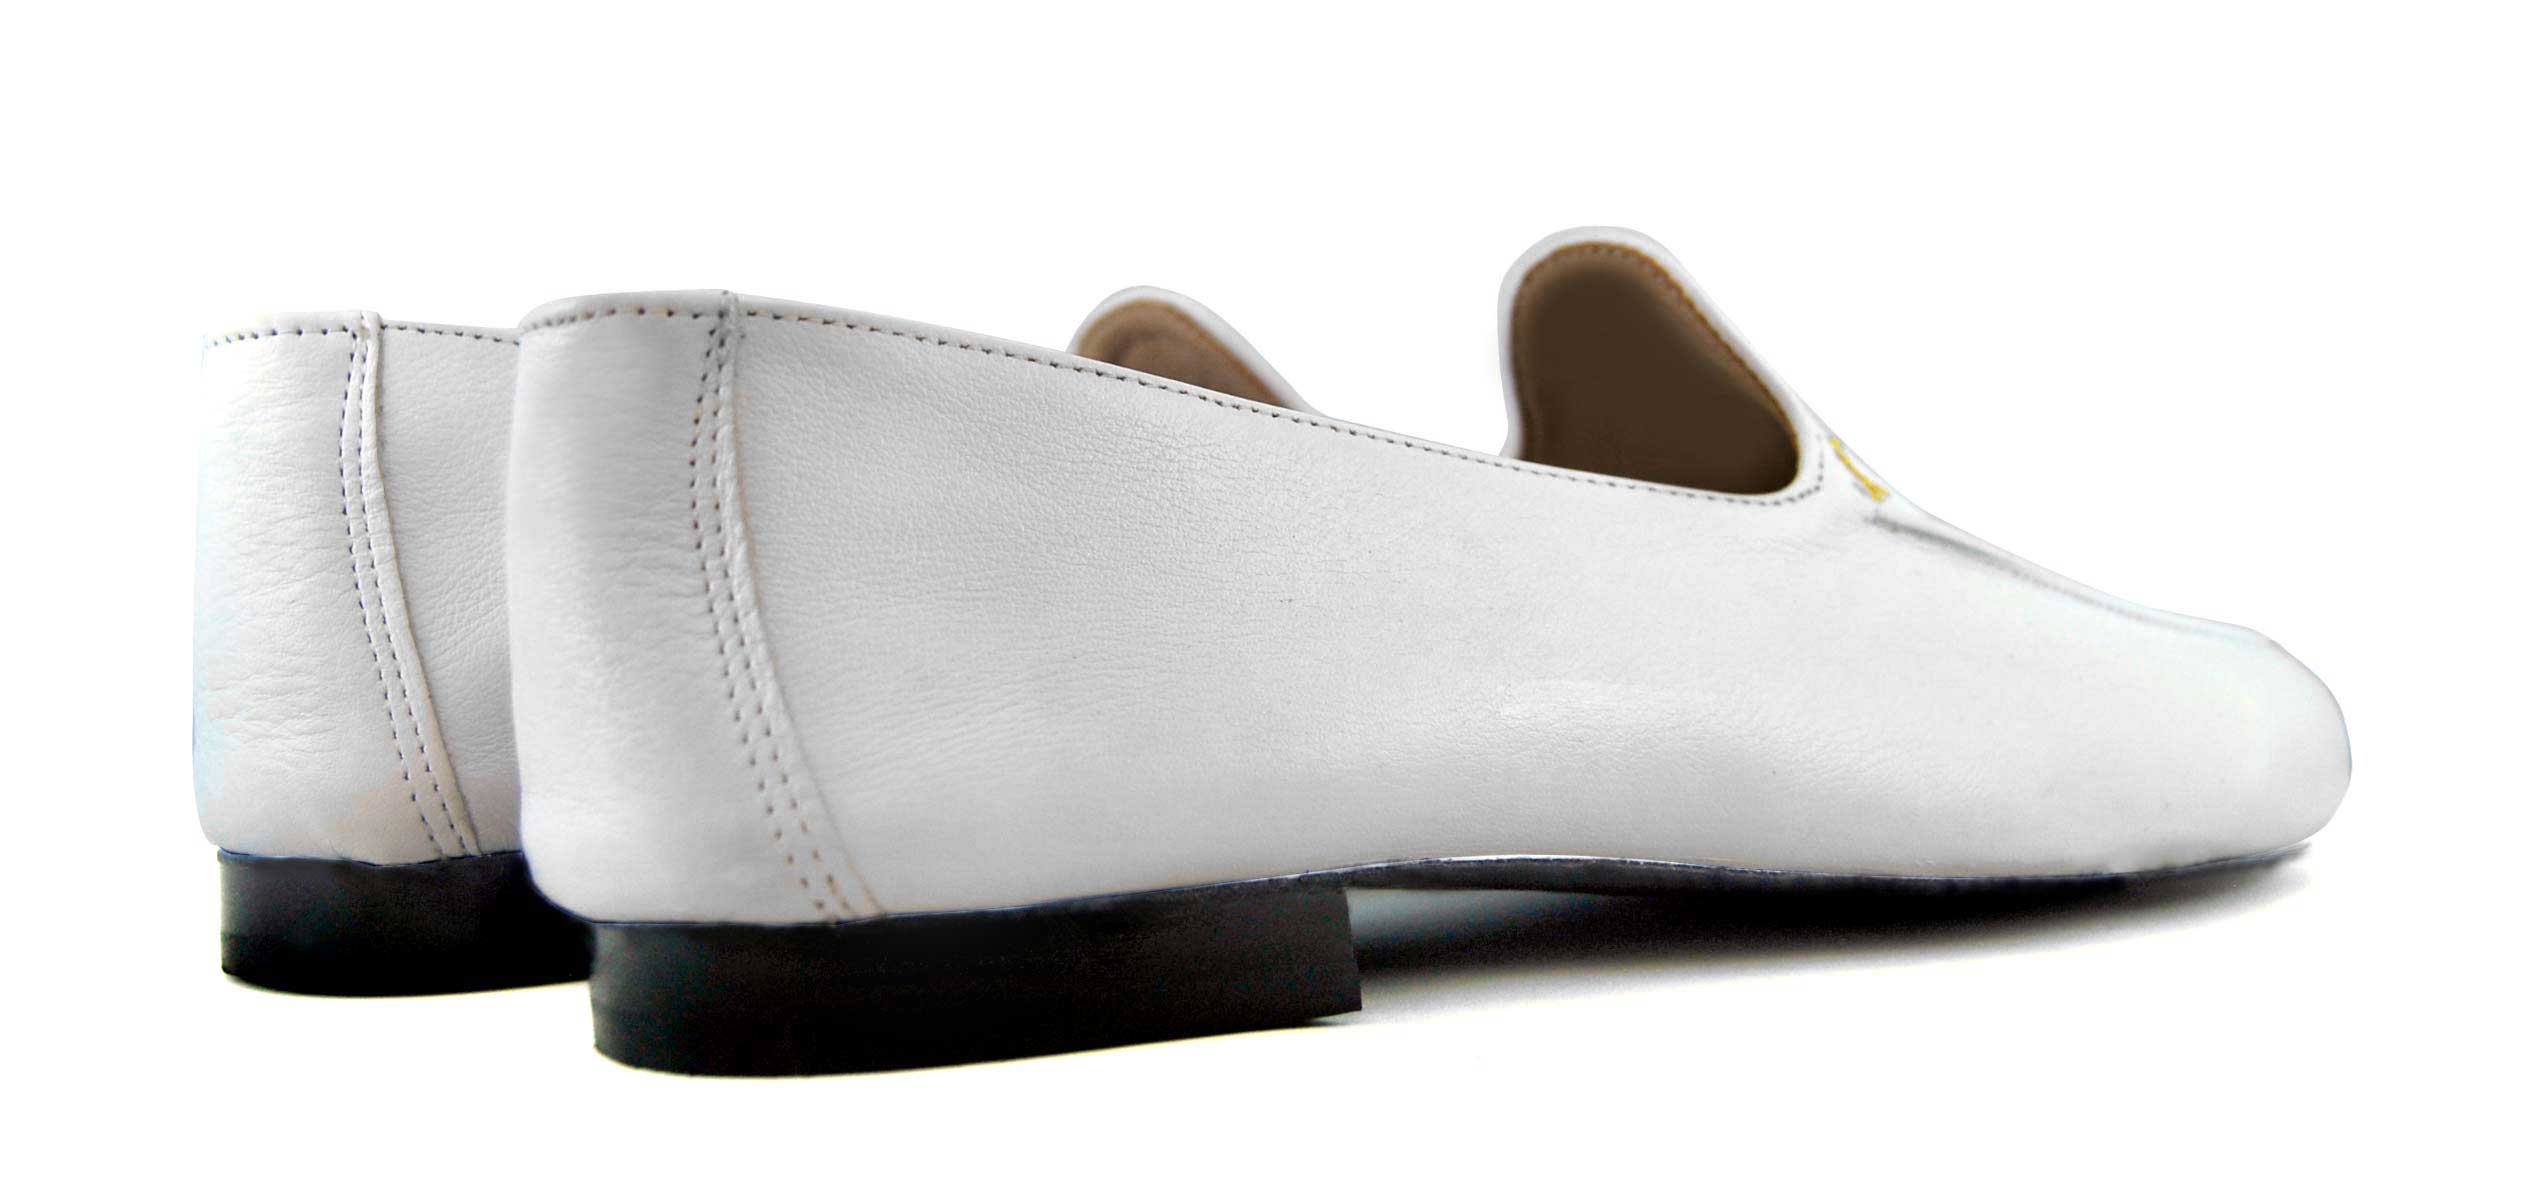 Foto 4 de Zapatos Julio Iglesias Mocasin 528 JC Blanco Napa